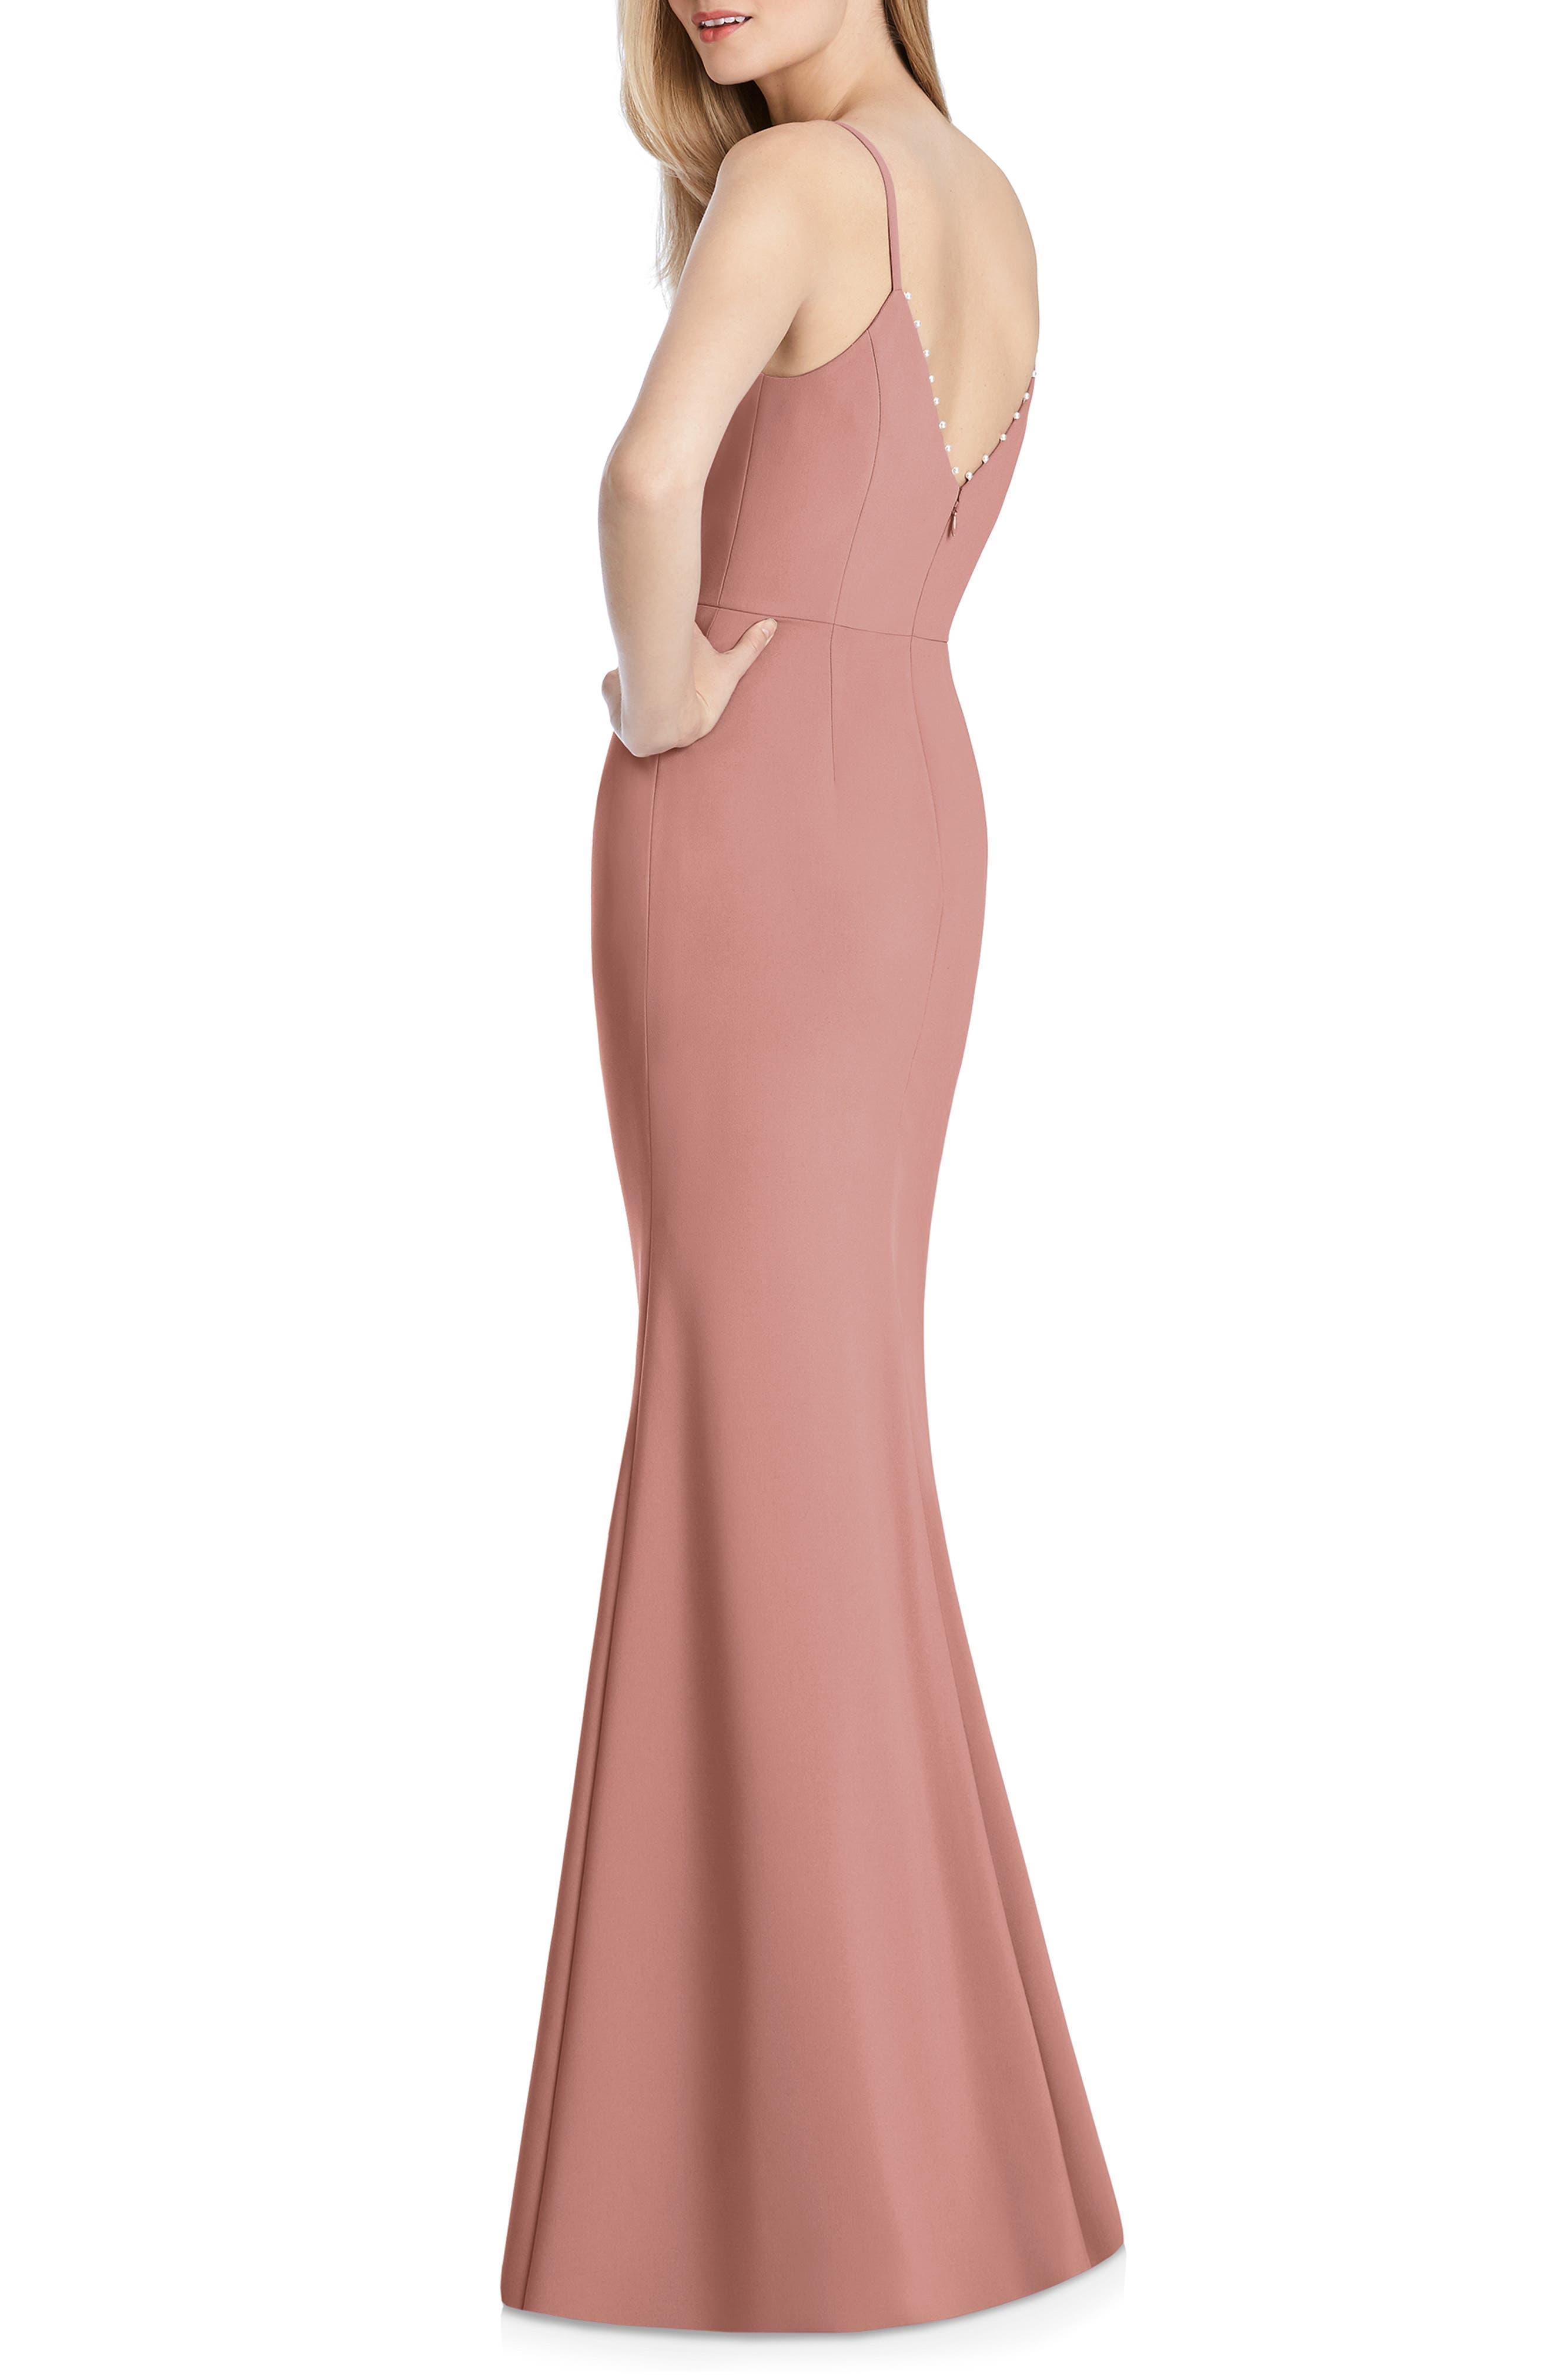 Lela Rose Bridesmaid Bridesmaid Dresses | Nordstrom